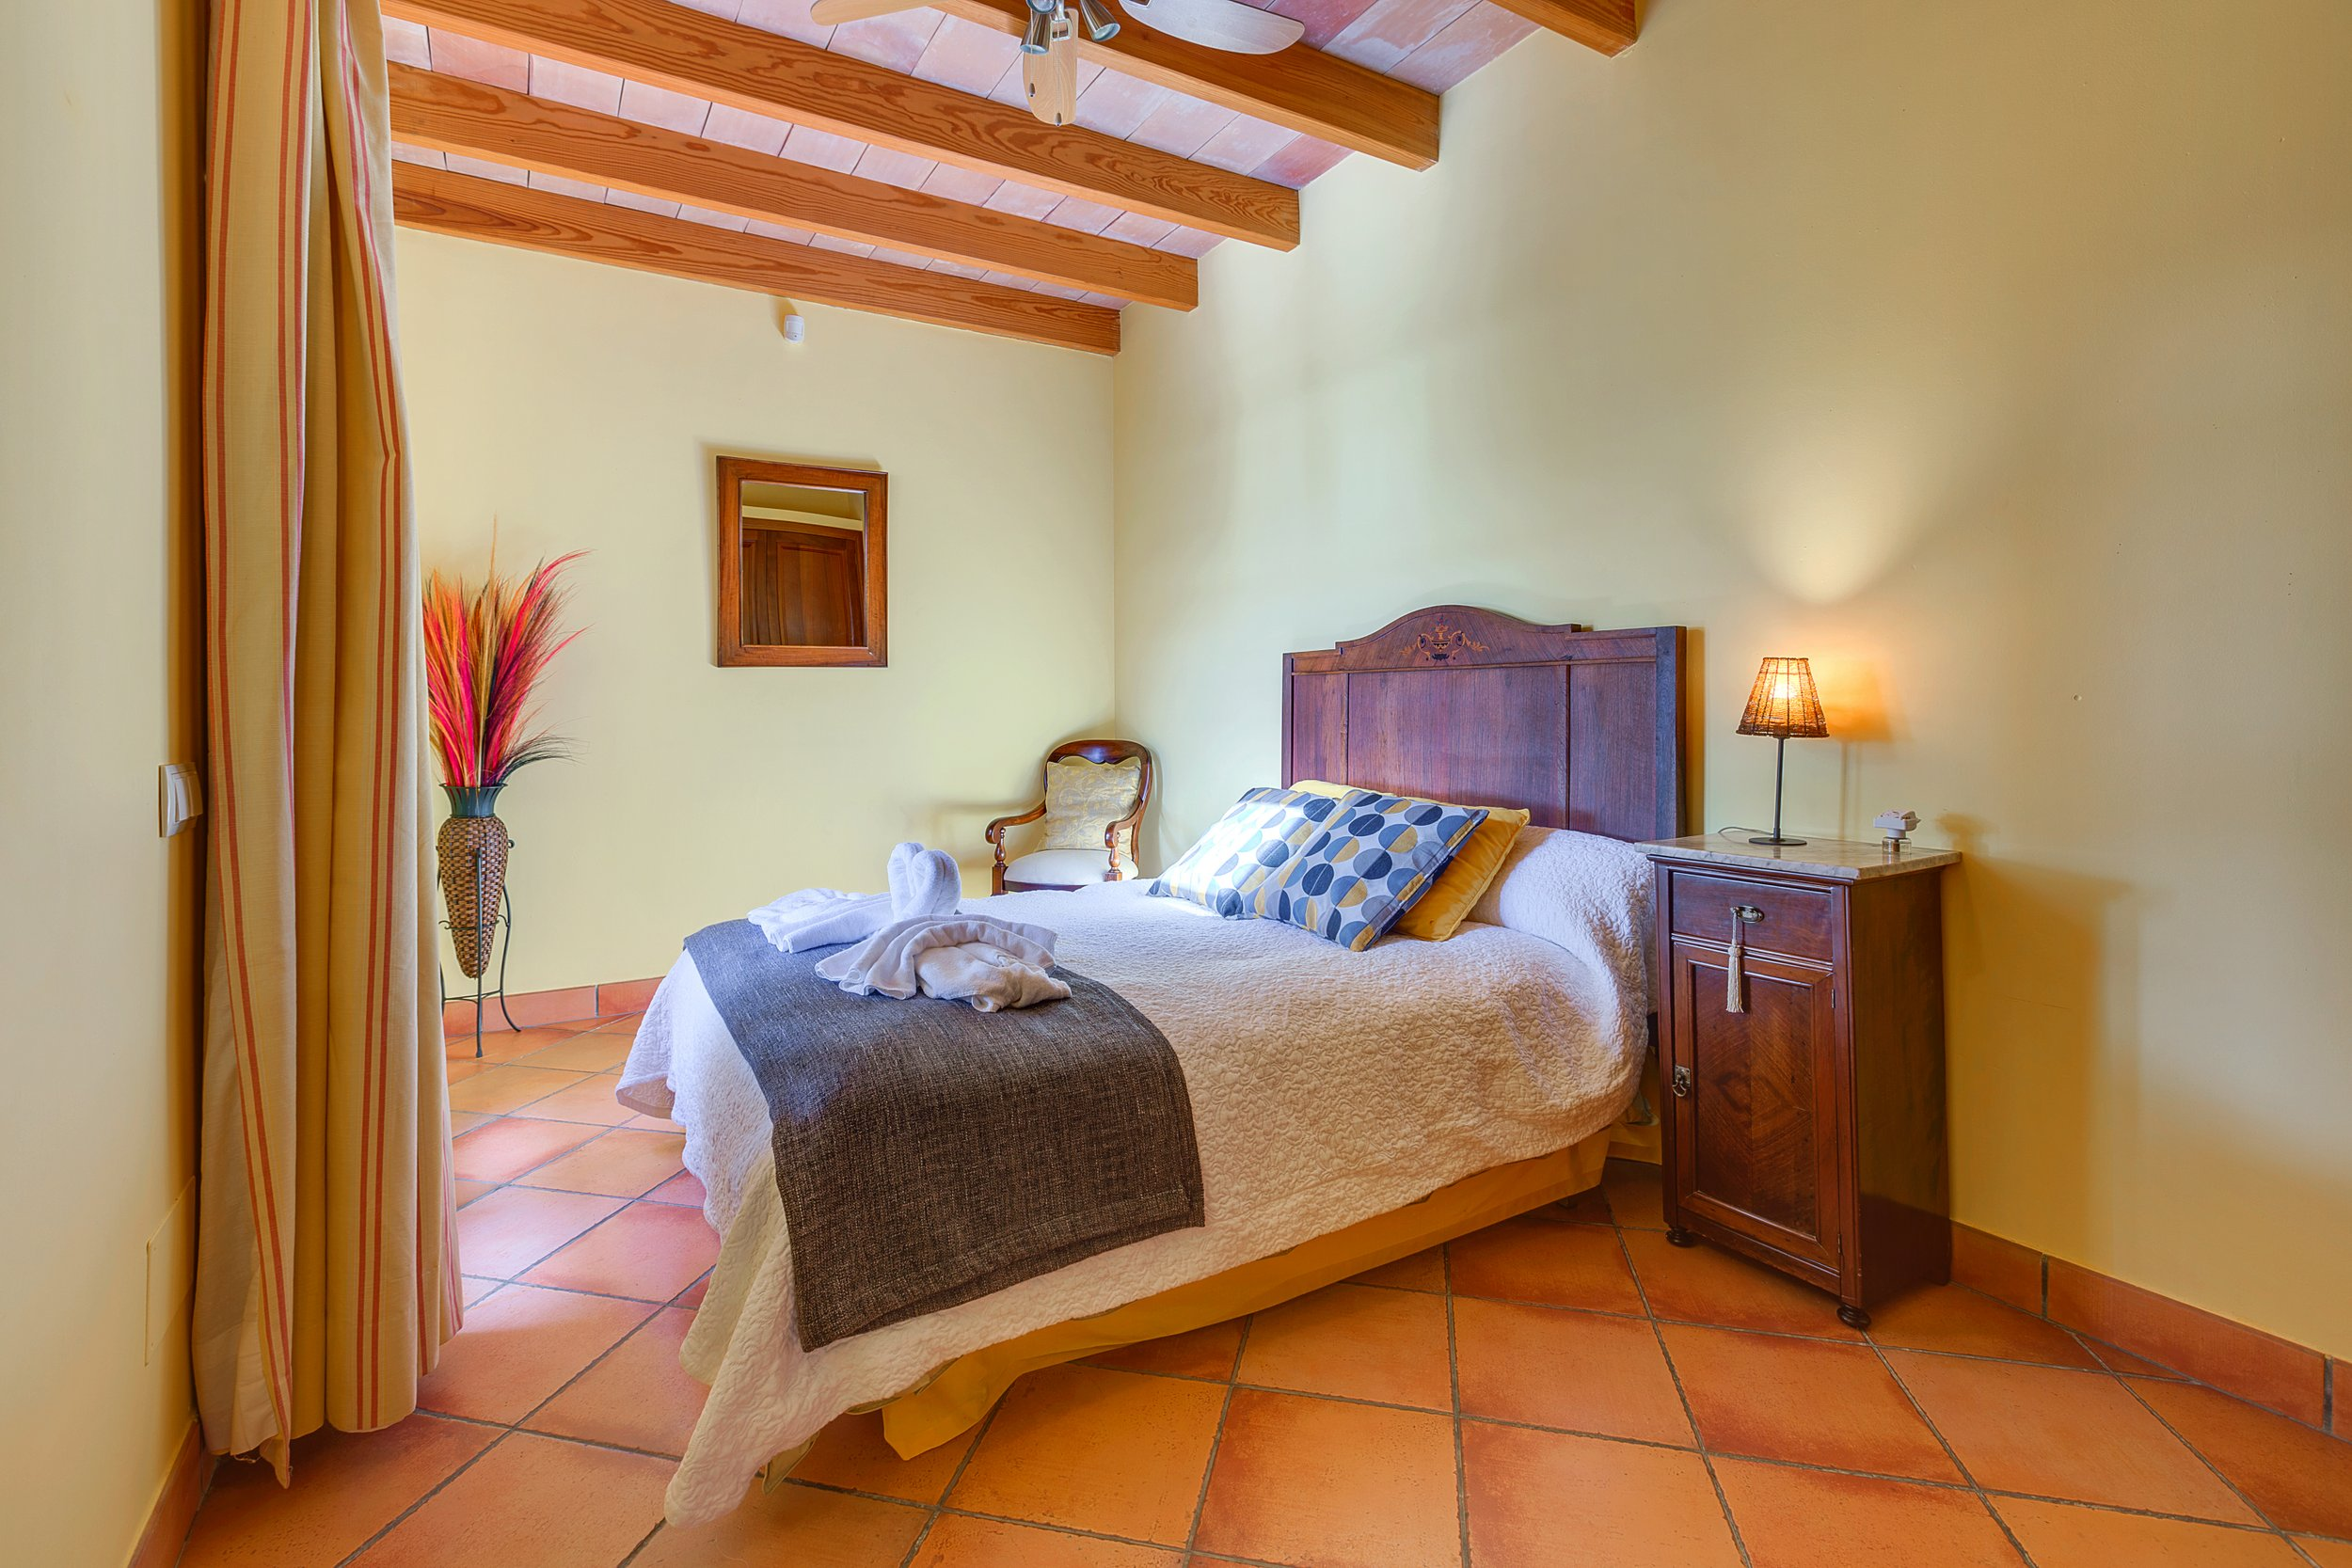 Maison de vacances Villa Cirera in Alaro (2611793), Alaro, Majorque, Iles Baléares, Espagne, image 24